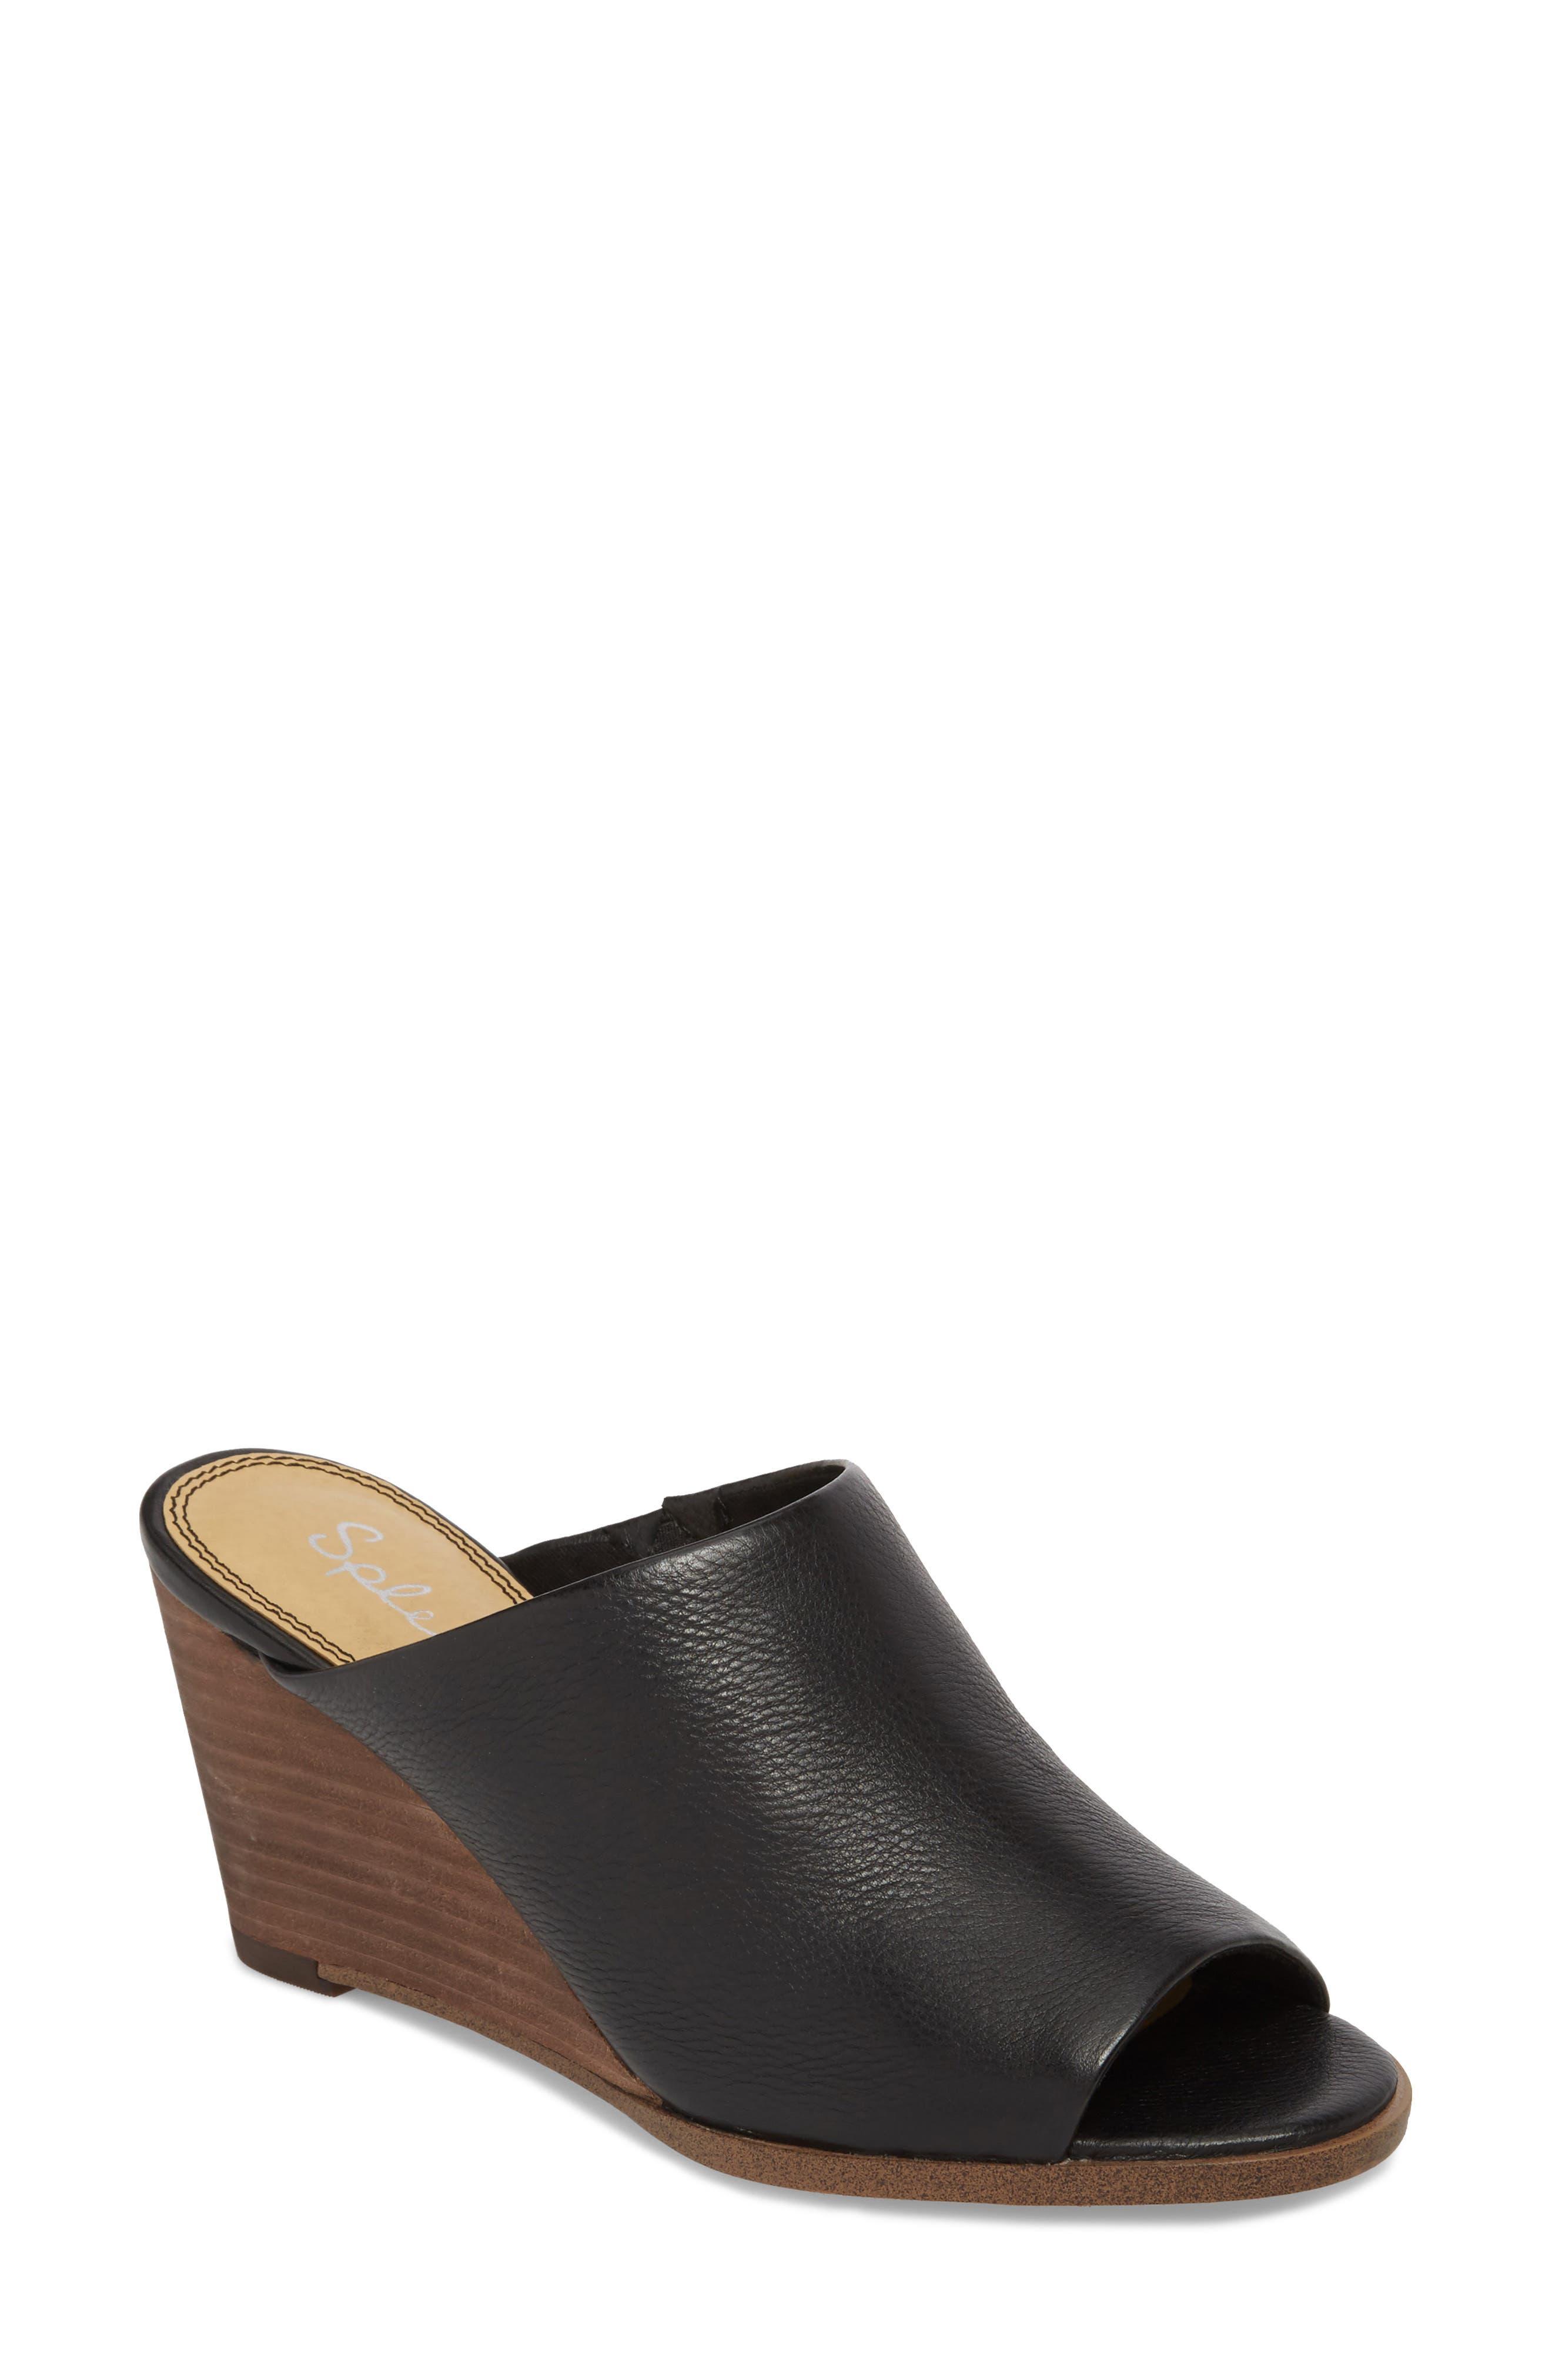 Splendid Fenwick Wedge Sandal